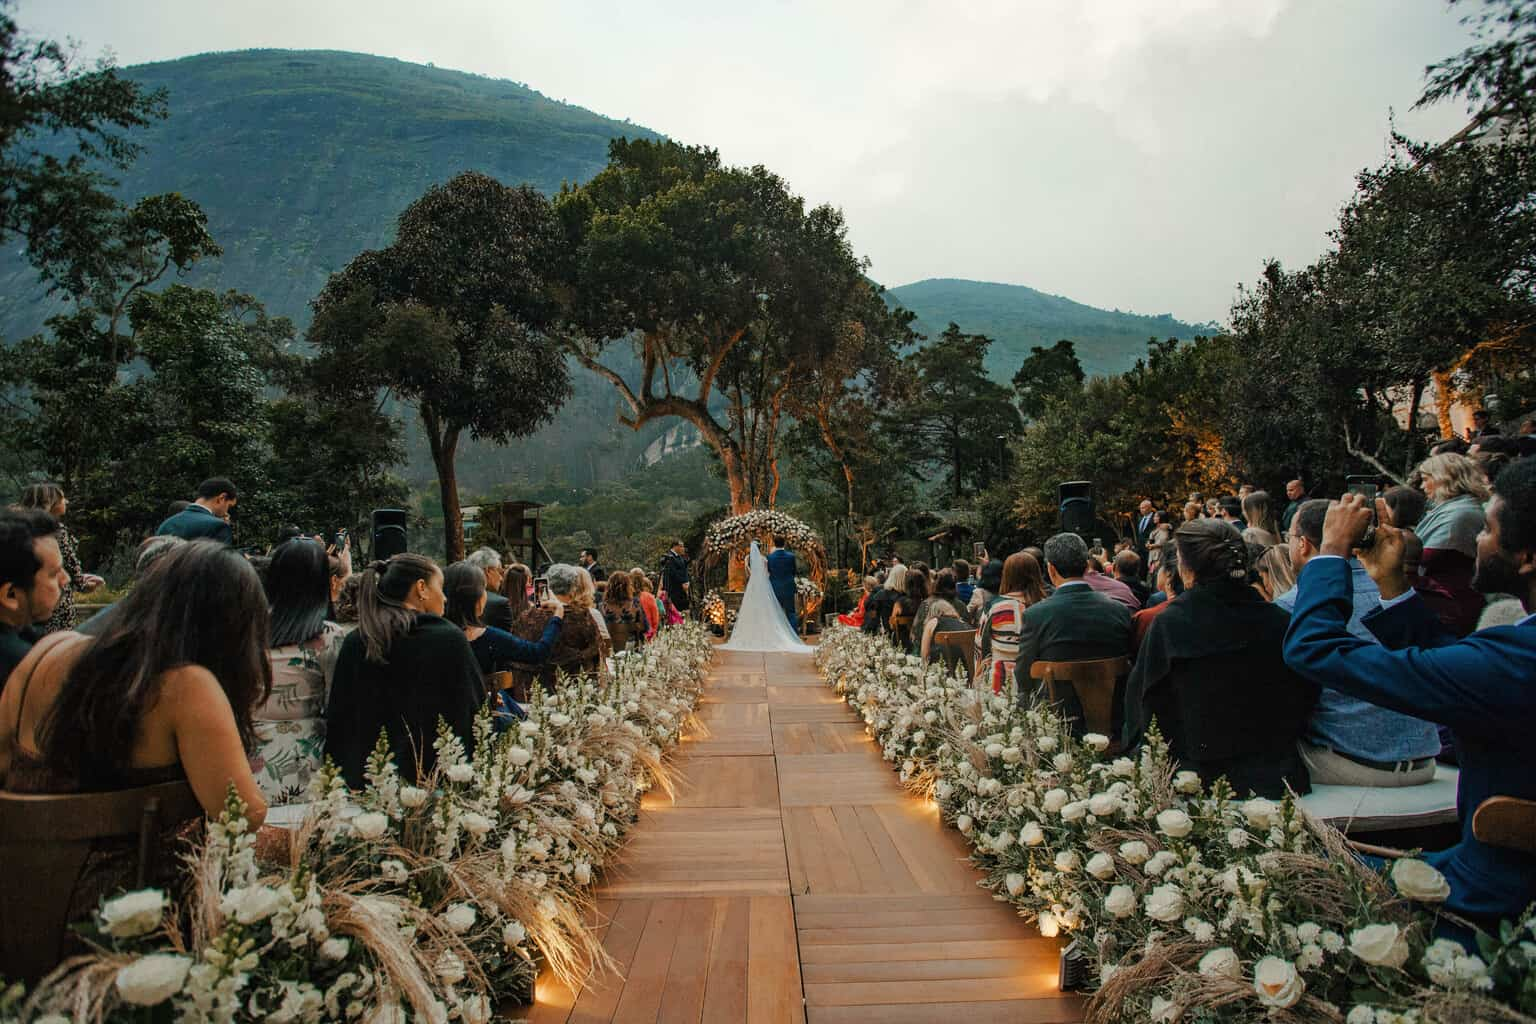 casamento-Beatriz-e-Joao-Fernando-cerimonia-ao-ar-livre-Itaipava-Locanda-Della-Mimosa-Thienny-Tammis143